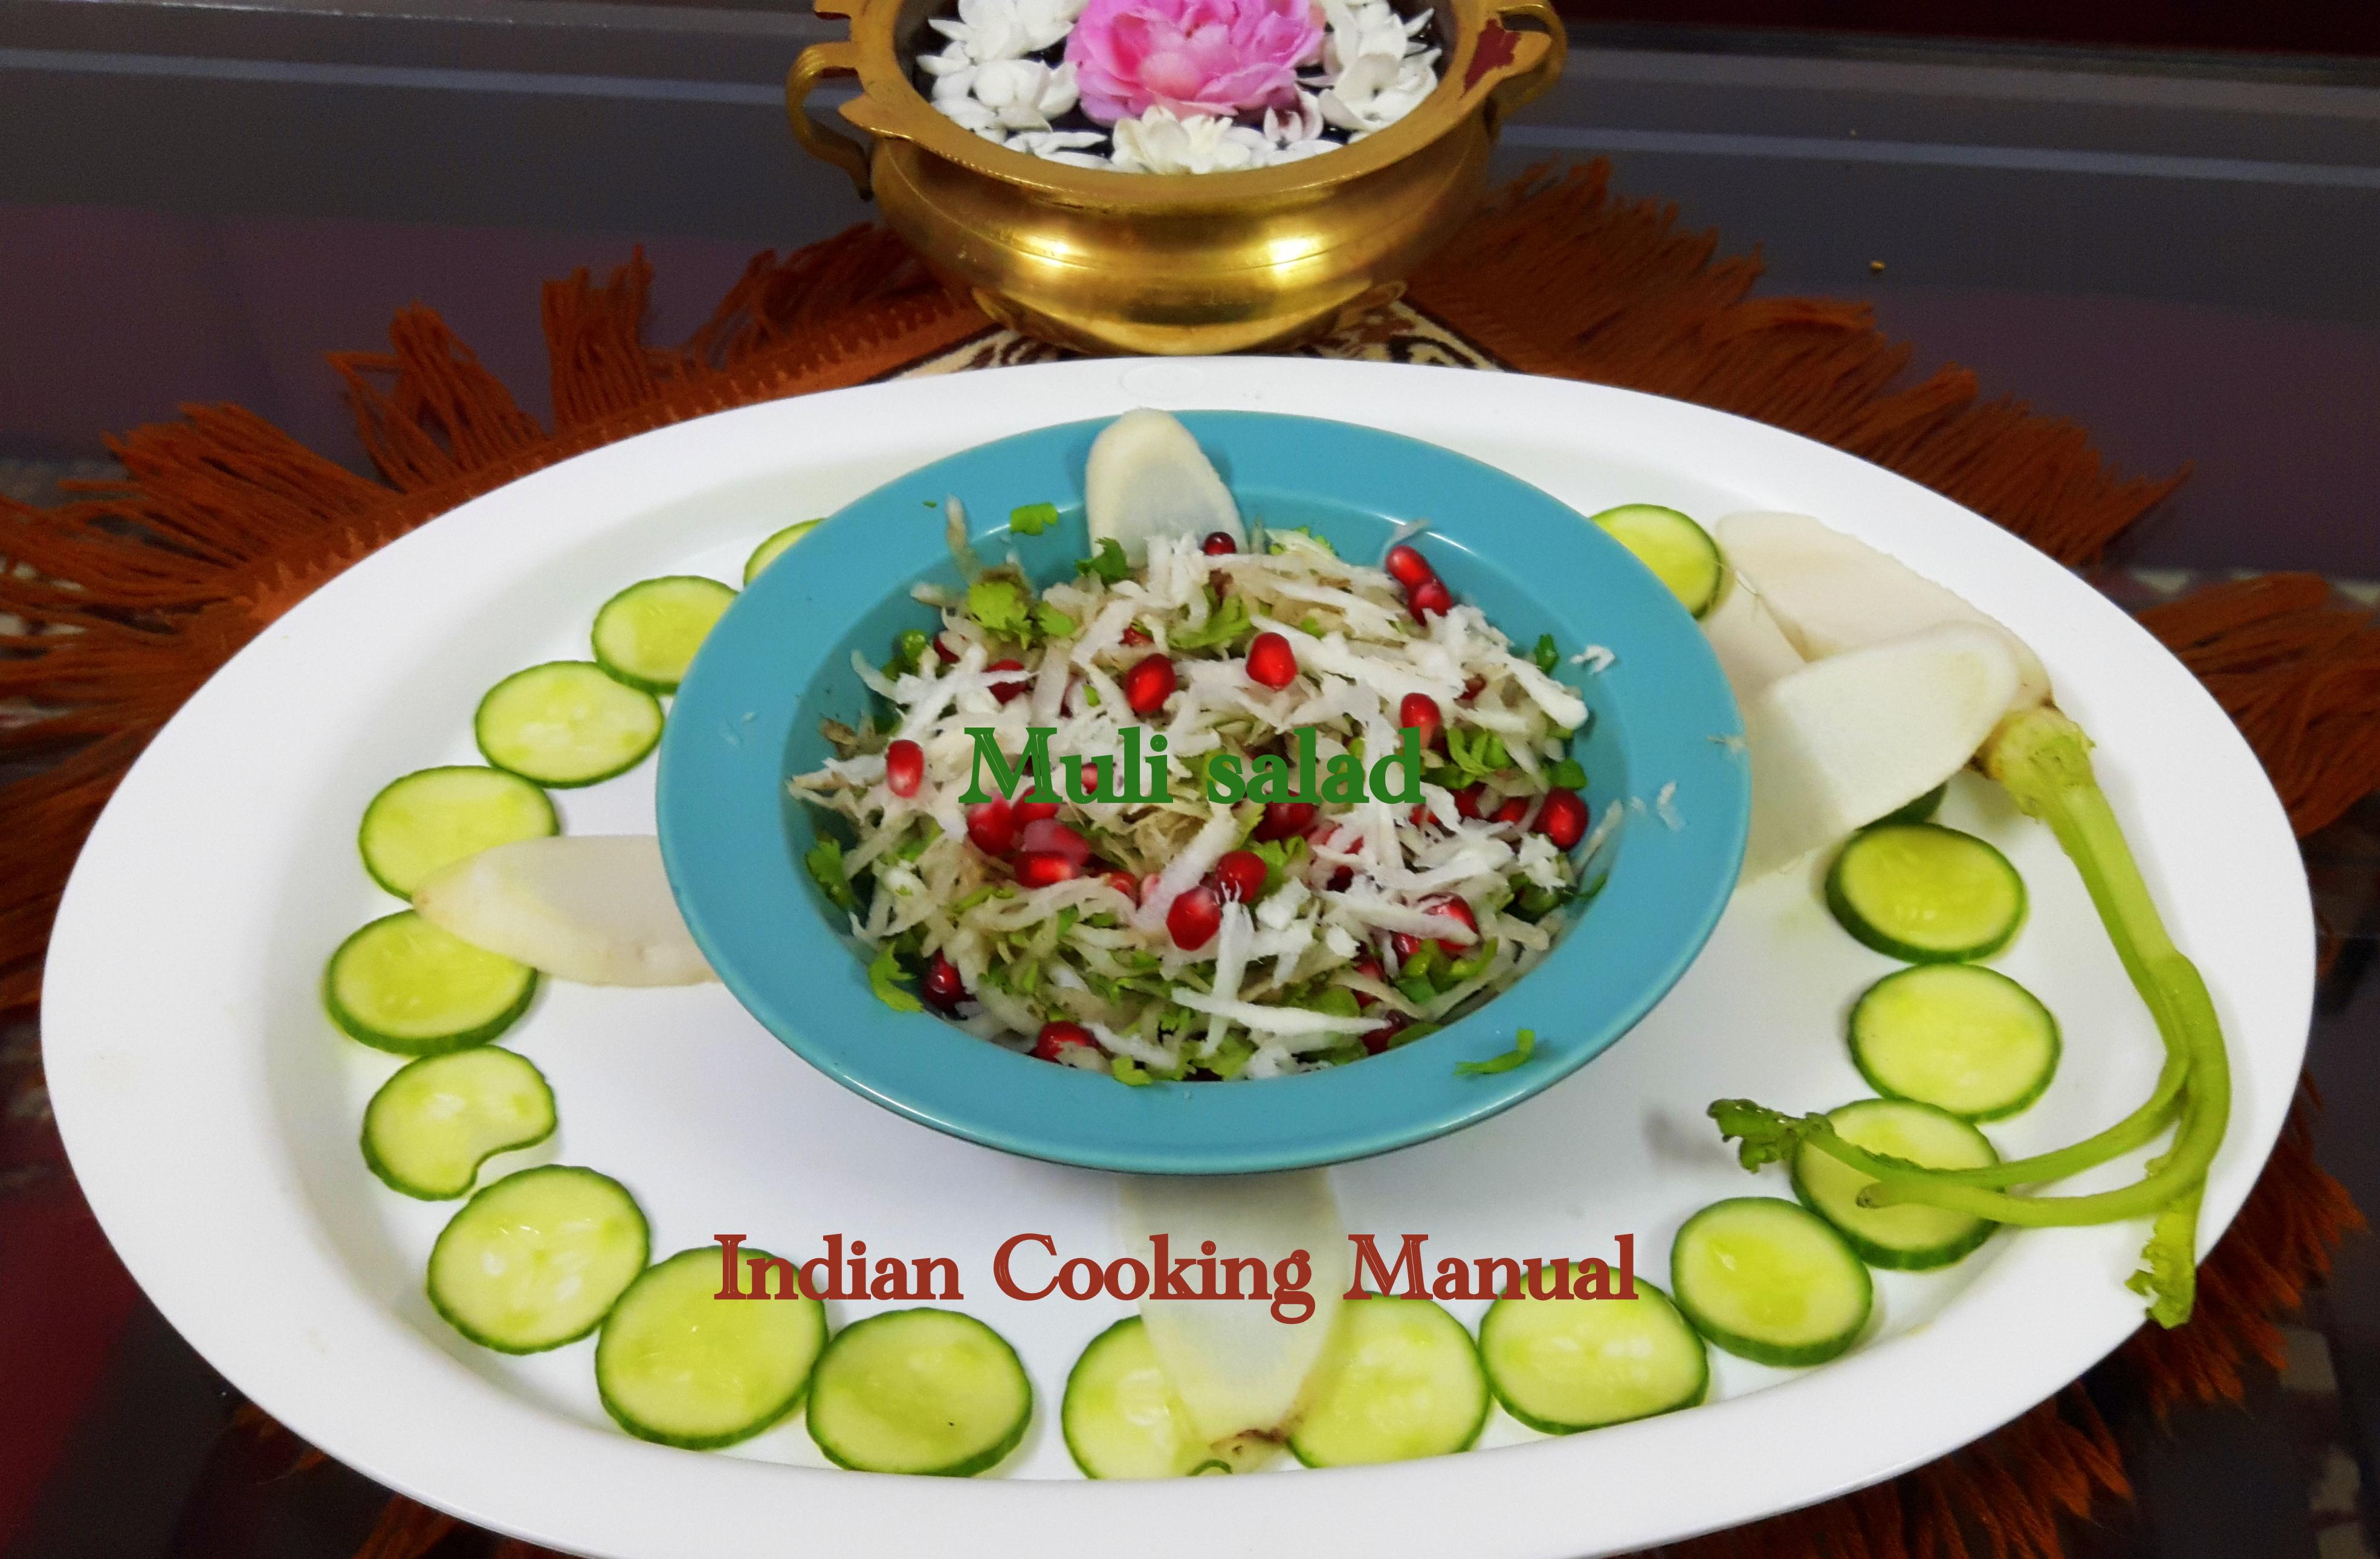 Muli salad (radish salad)